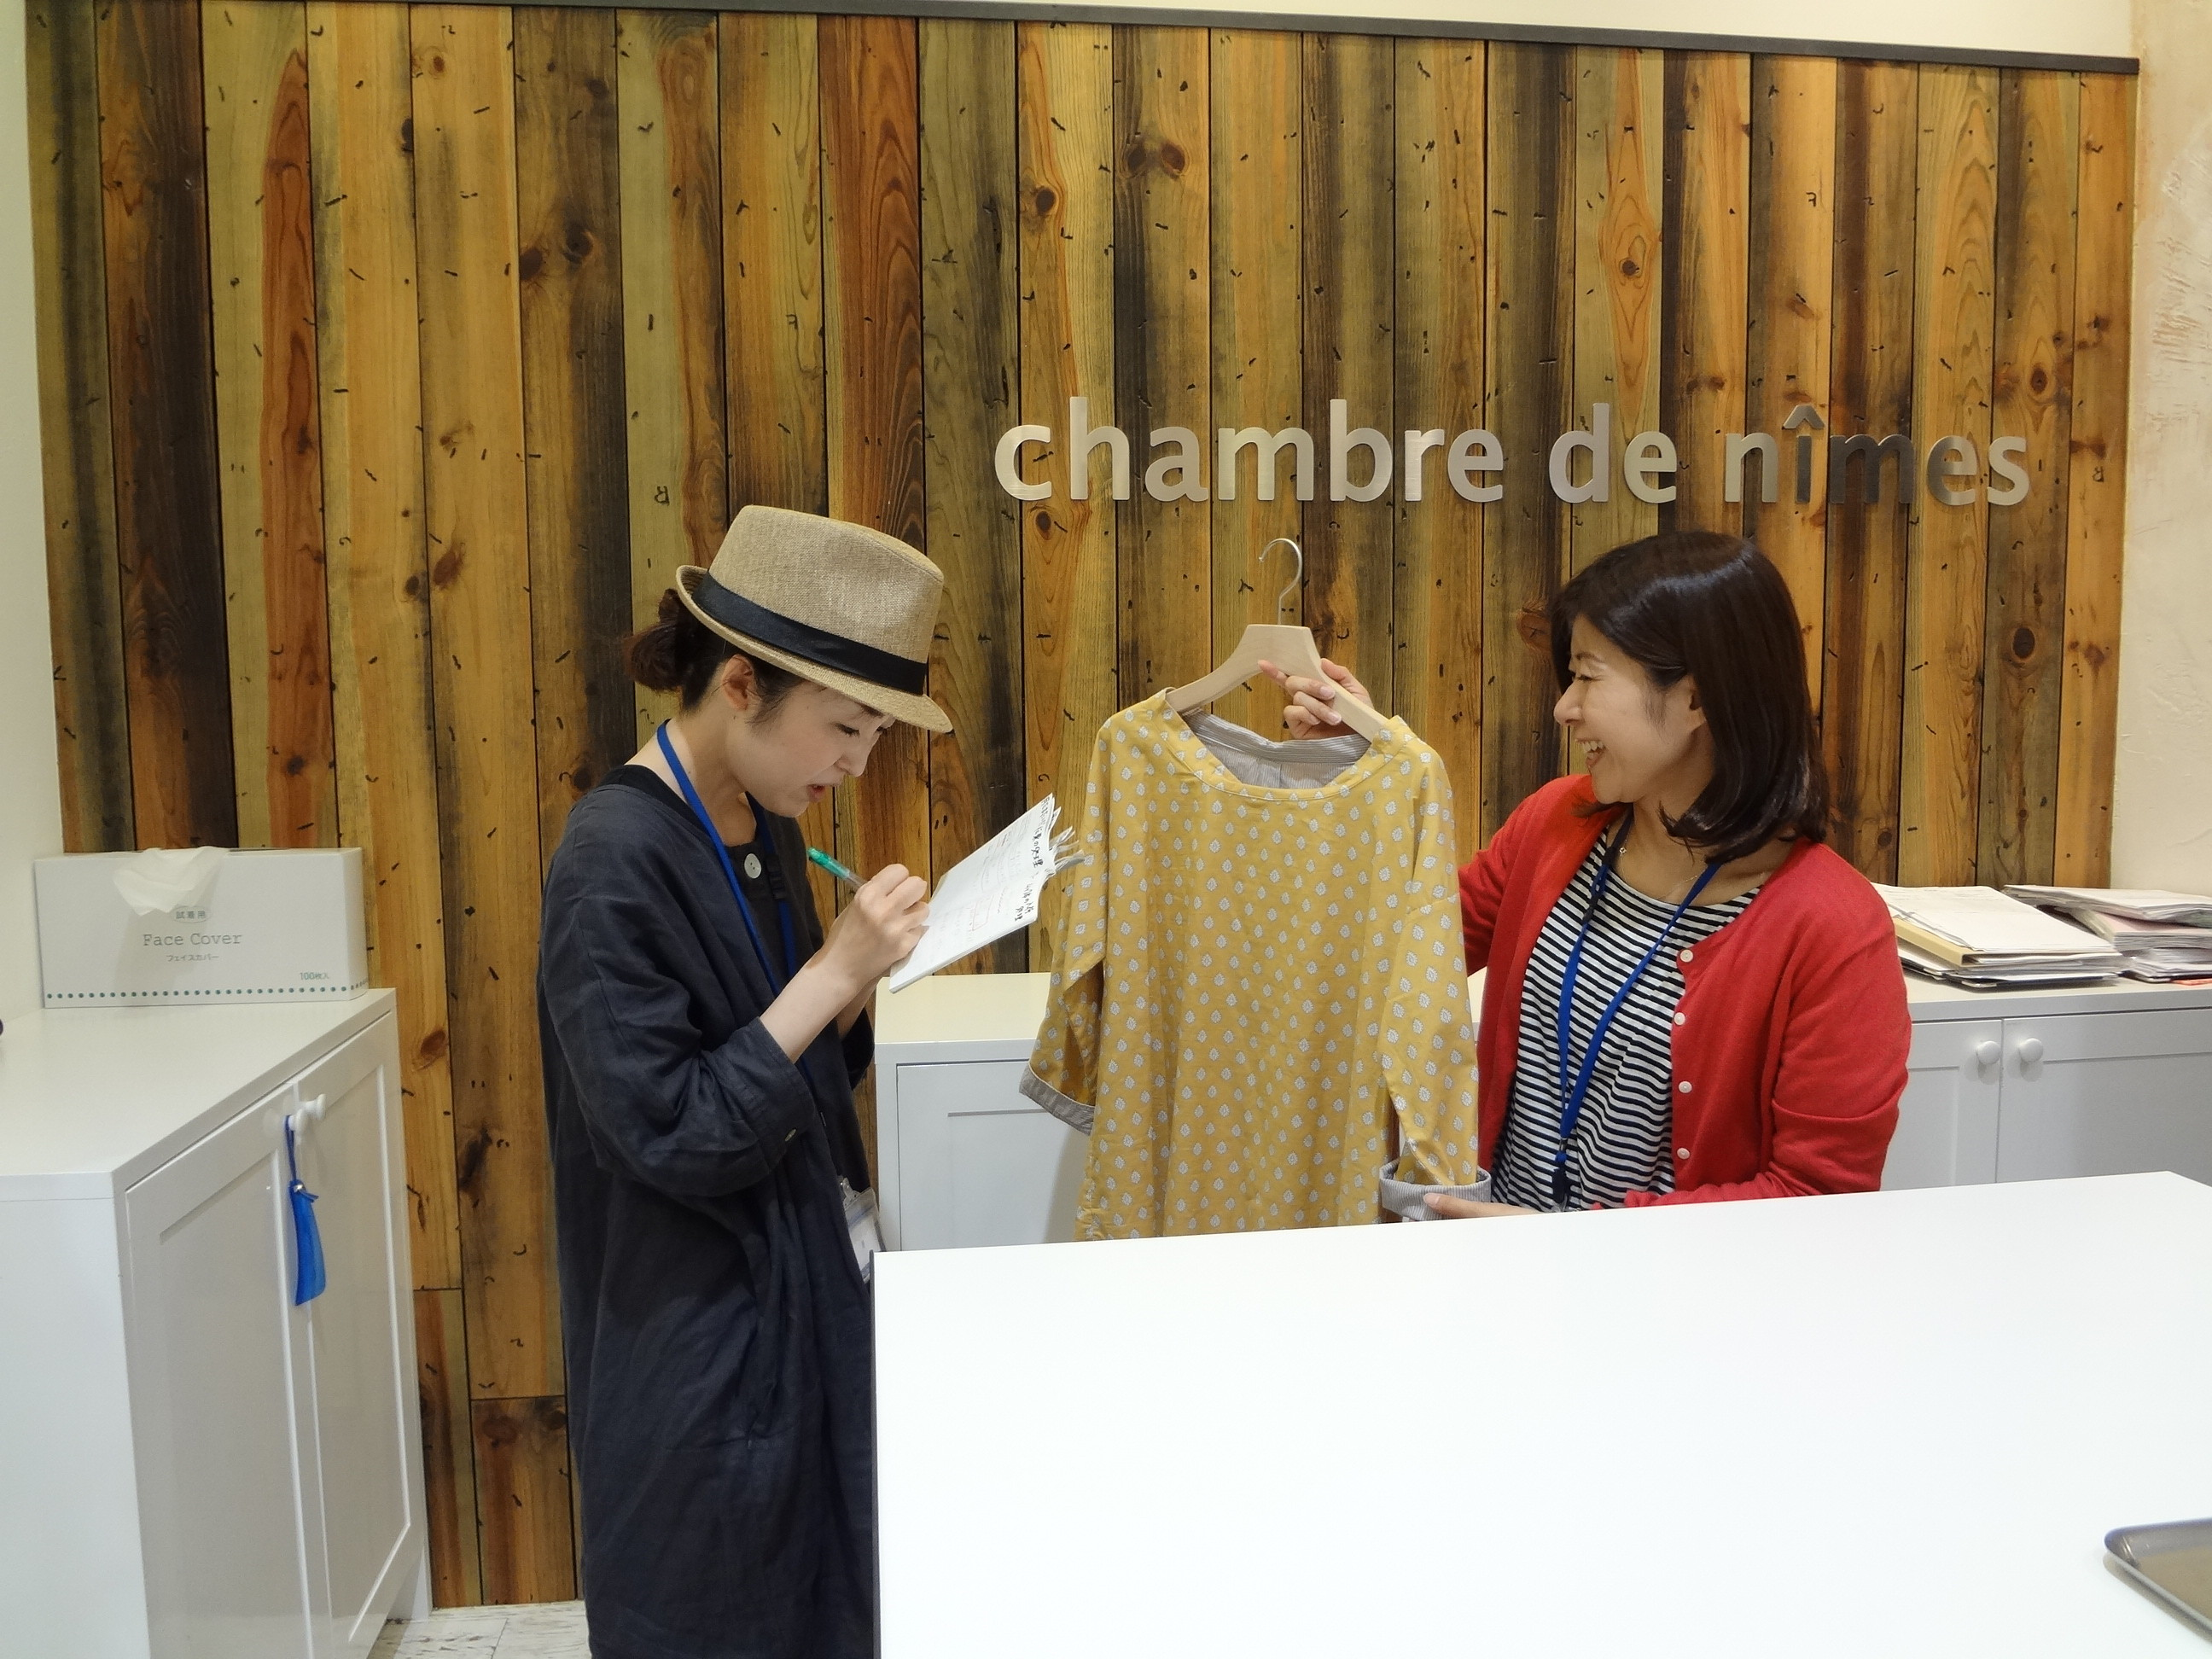 chambre de nimes(シャンブルドニーム) 木の葉モール橋本店のアルバイト情報